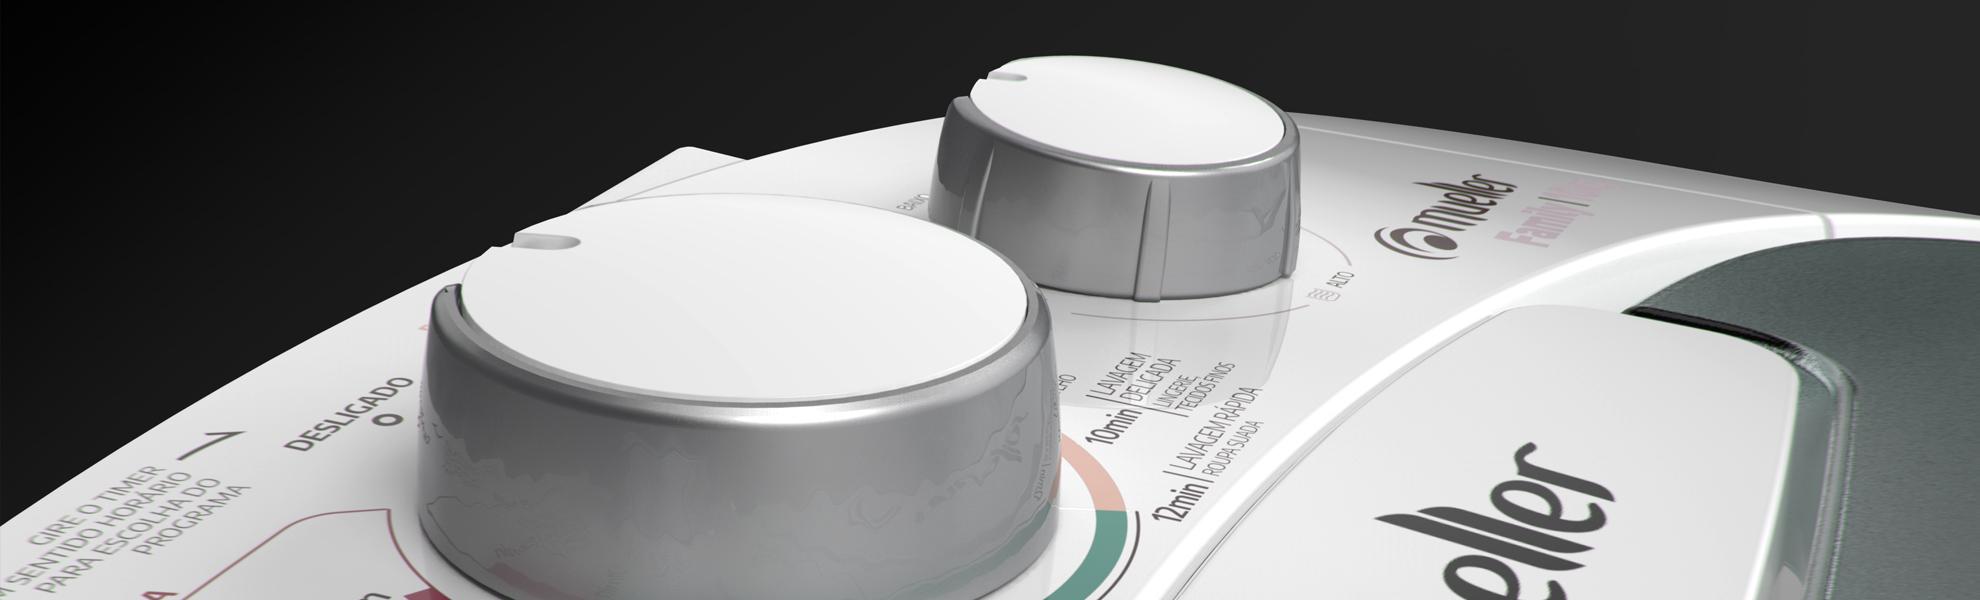 chelles-e-hayashi-design-portfolio-mueller-lavadora-family-sustentabilidade-produto-industria